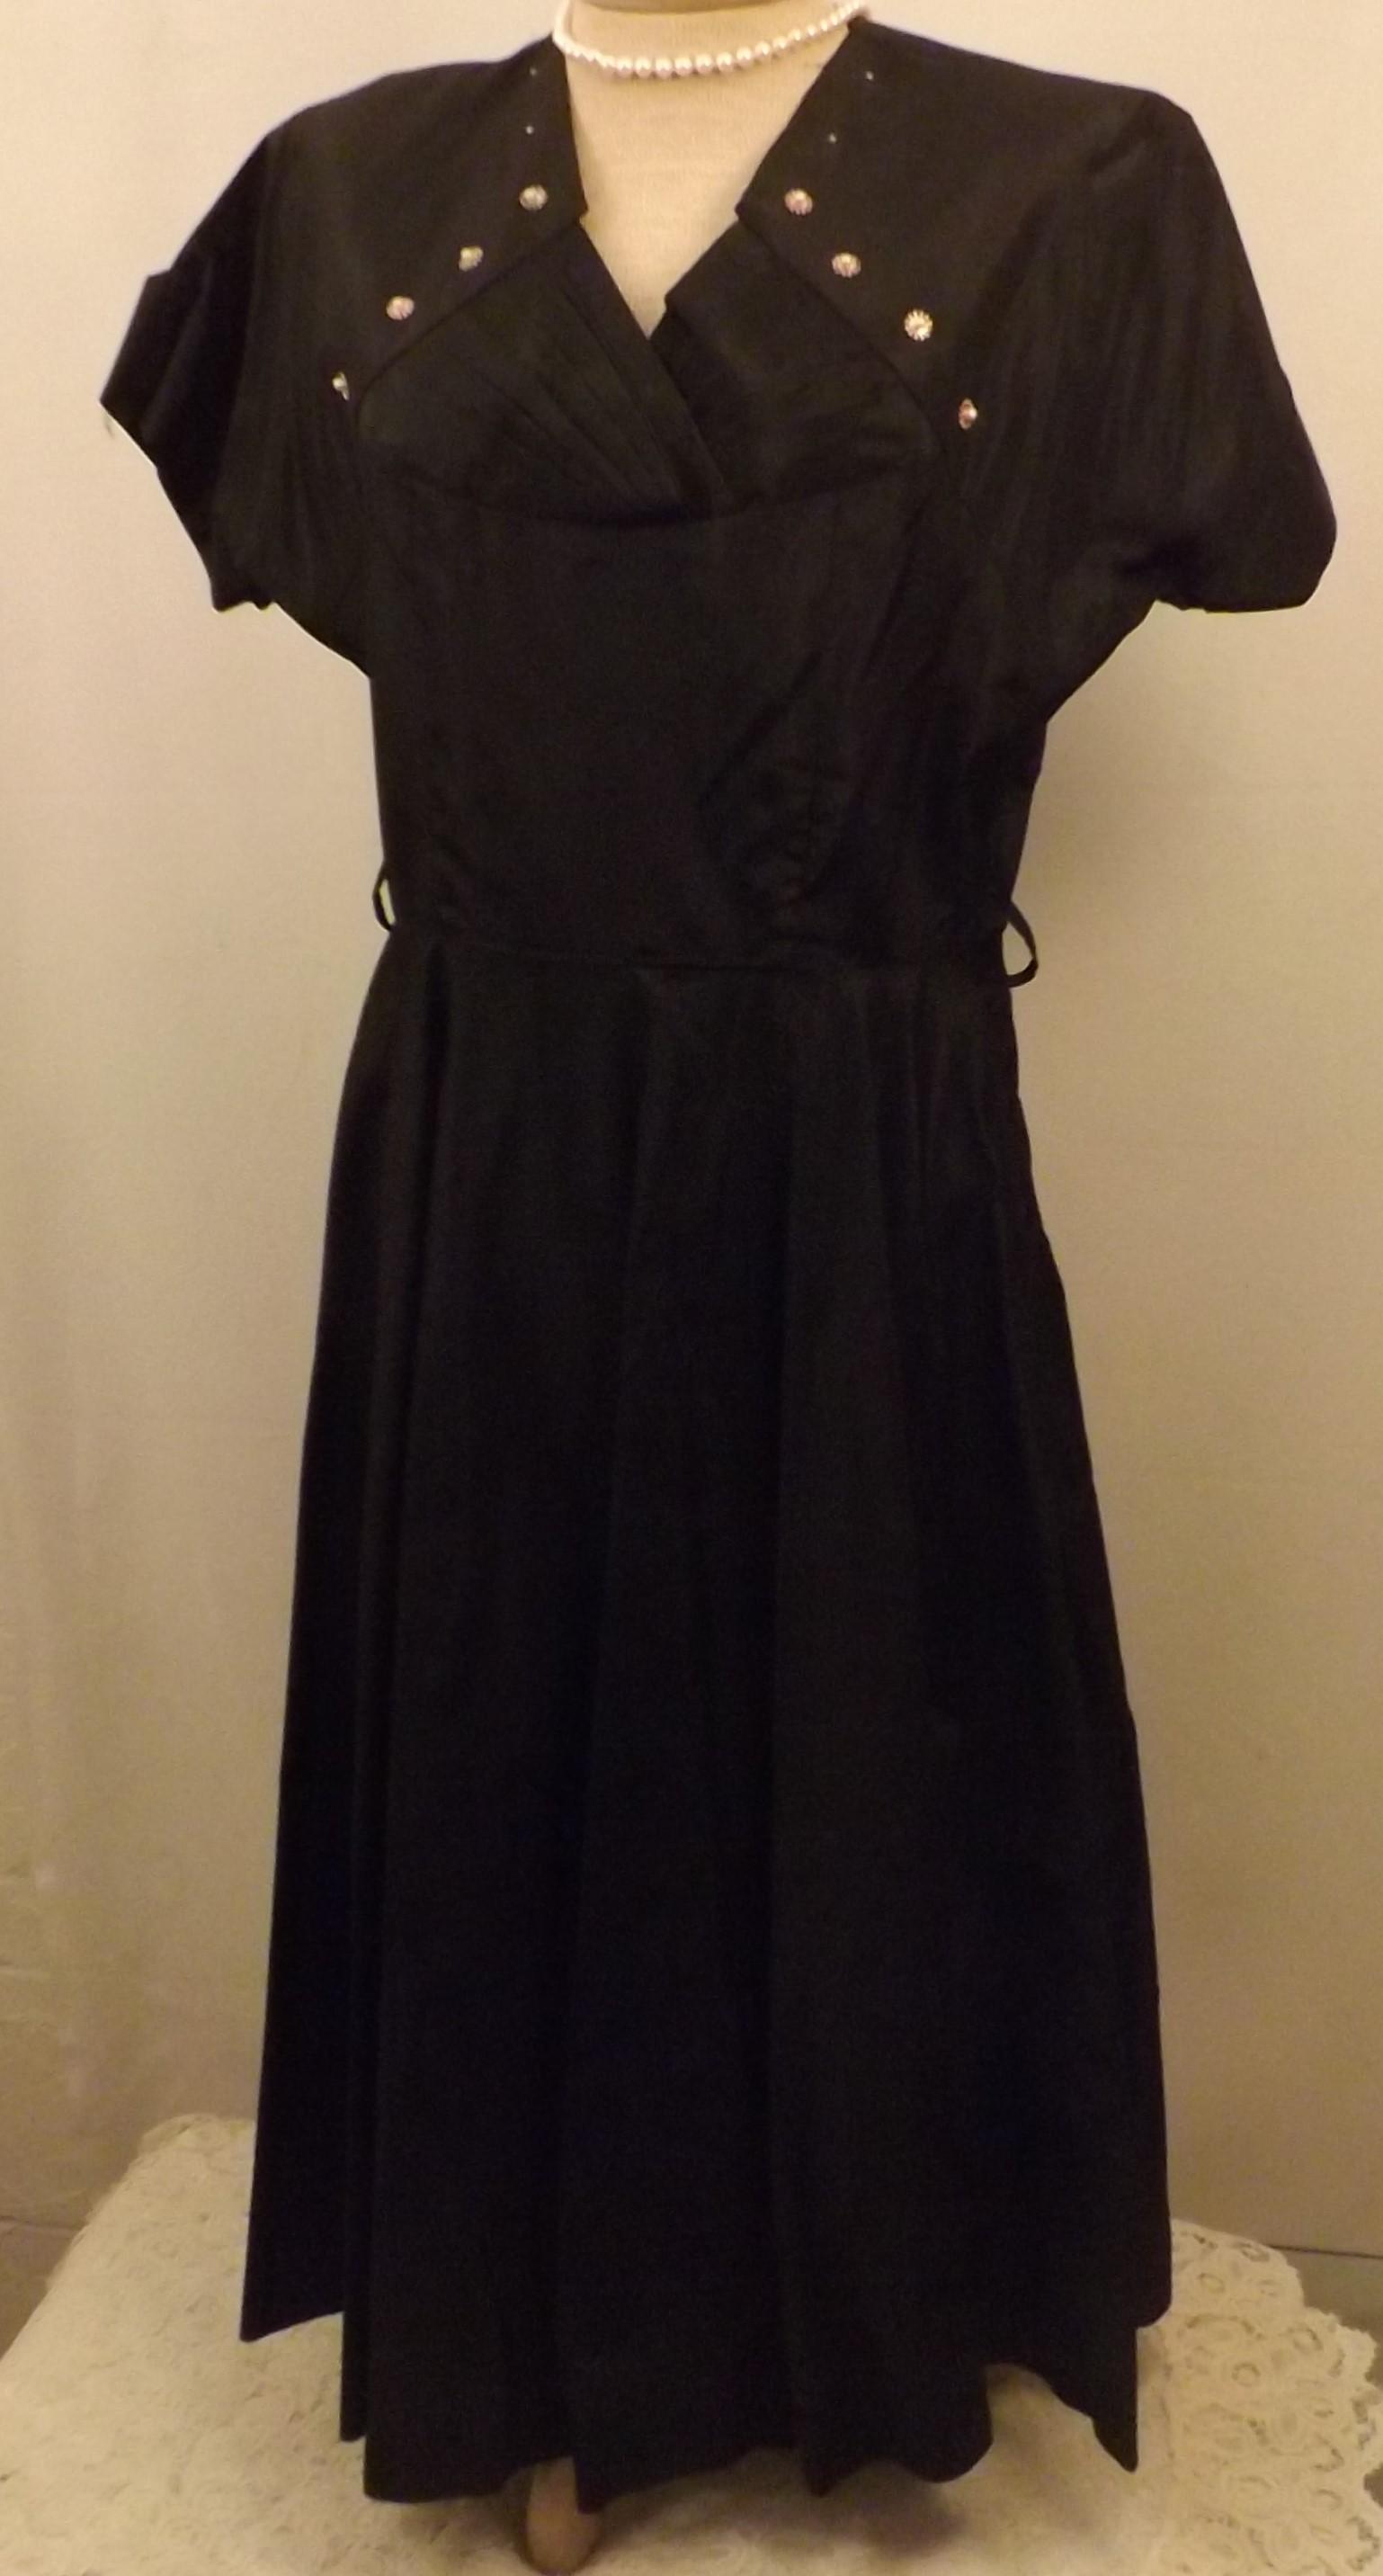 69cf8eb7e8f Black Evening Dress Size 12